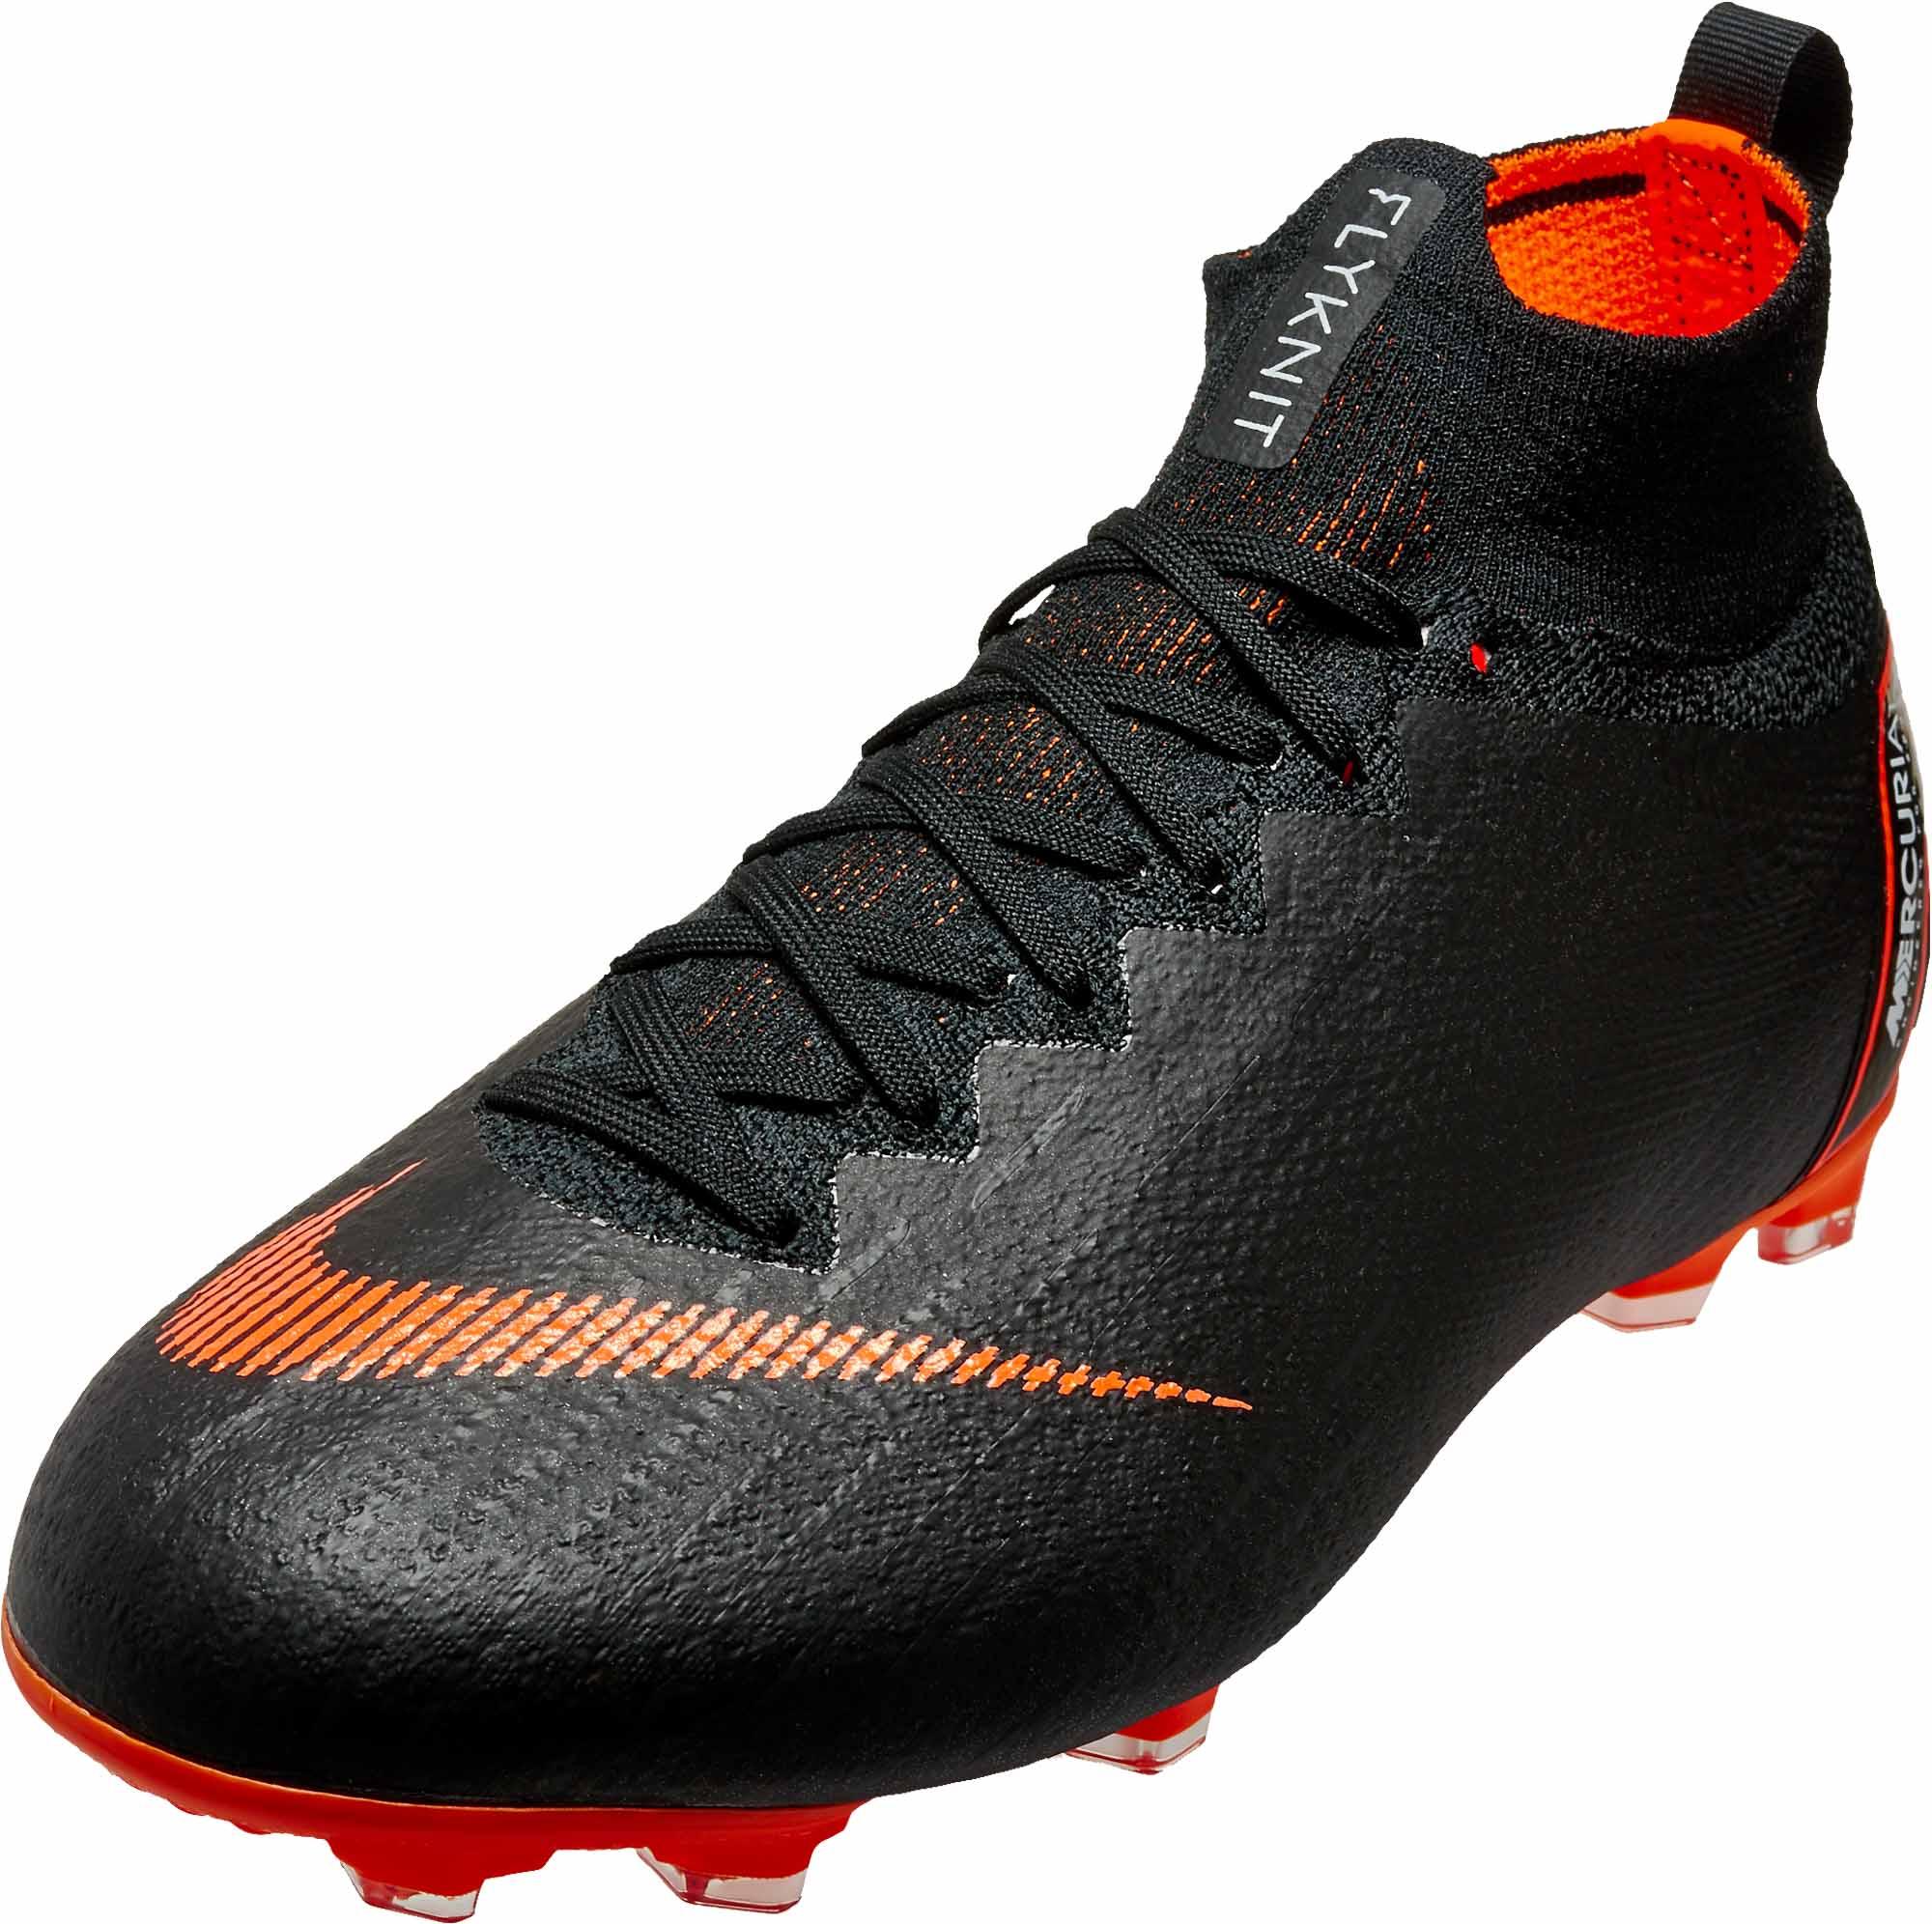 2a2fd4a7727 Nike Kids Superfly 6 Elite FG- Youth Nike Soccer Cleats